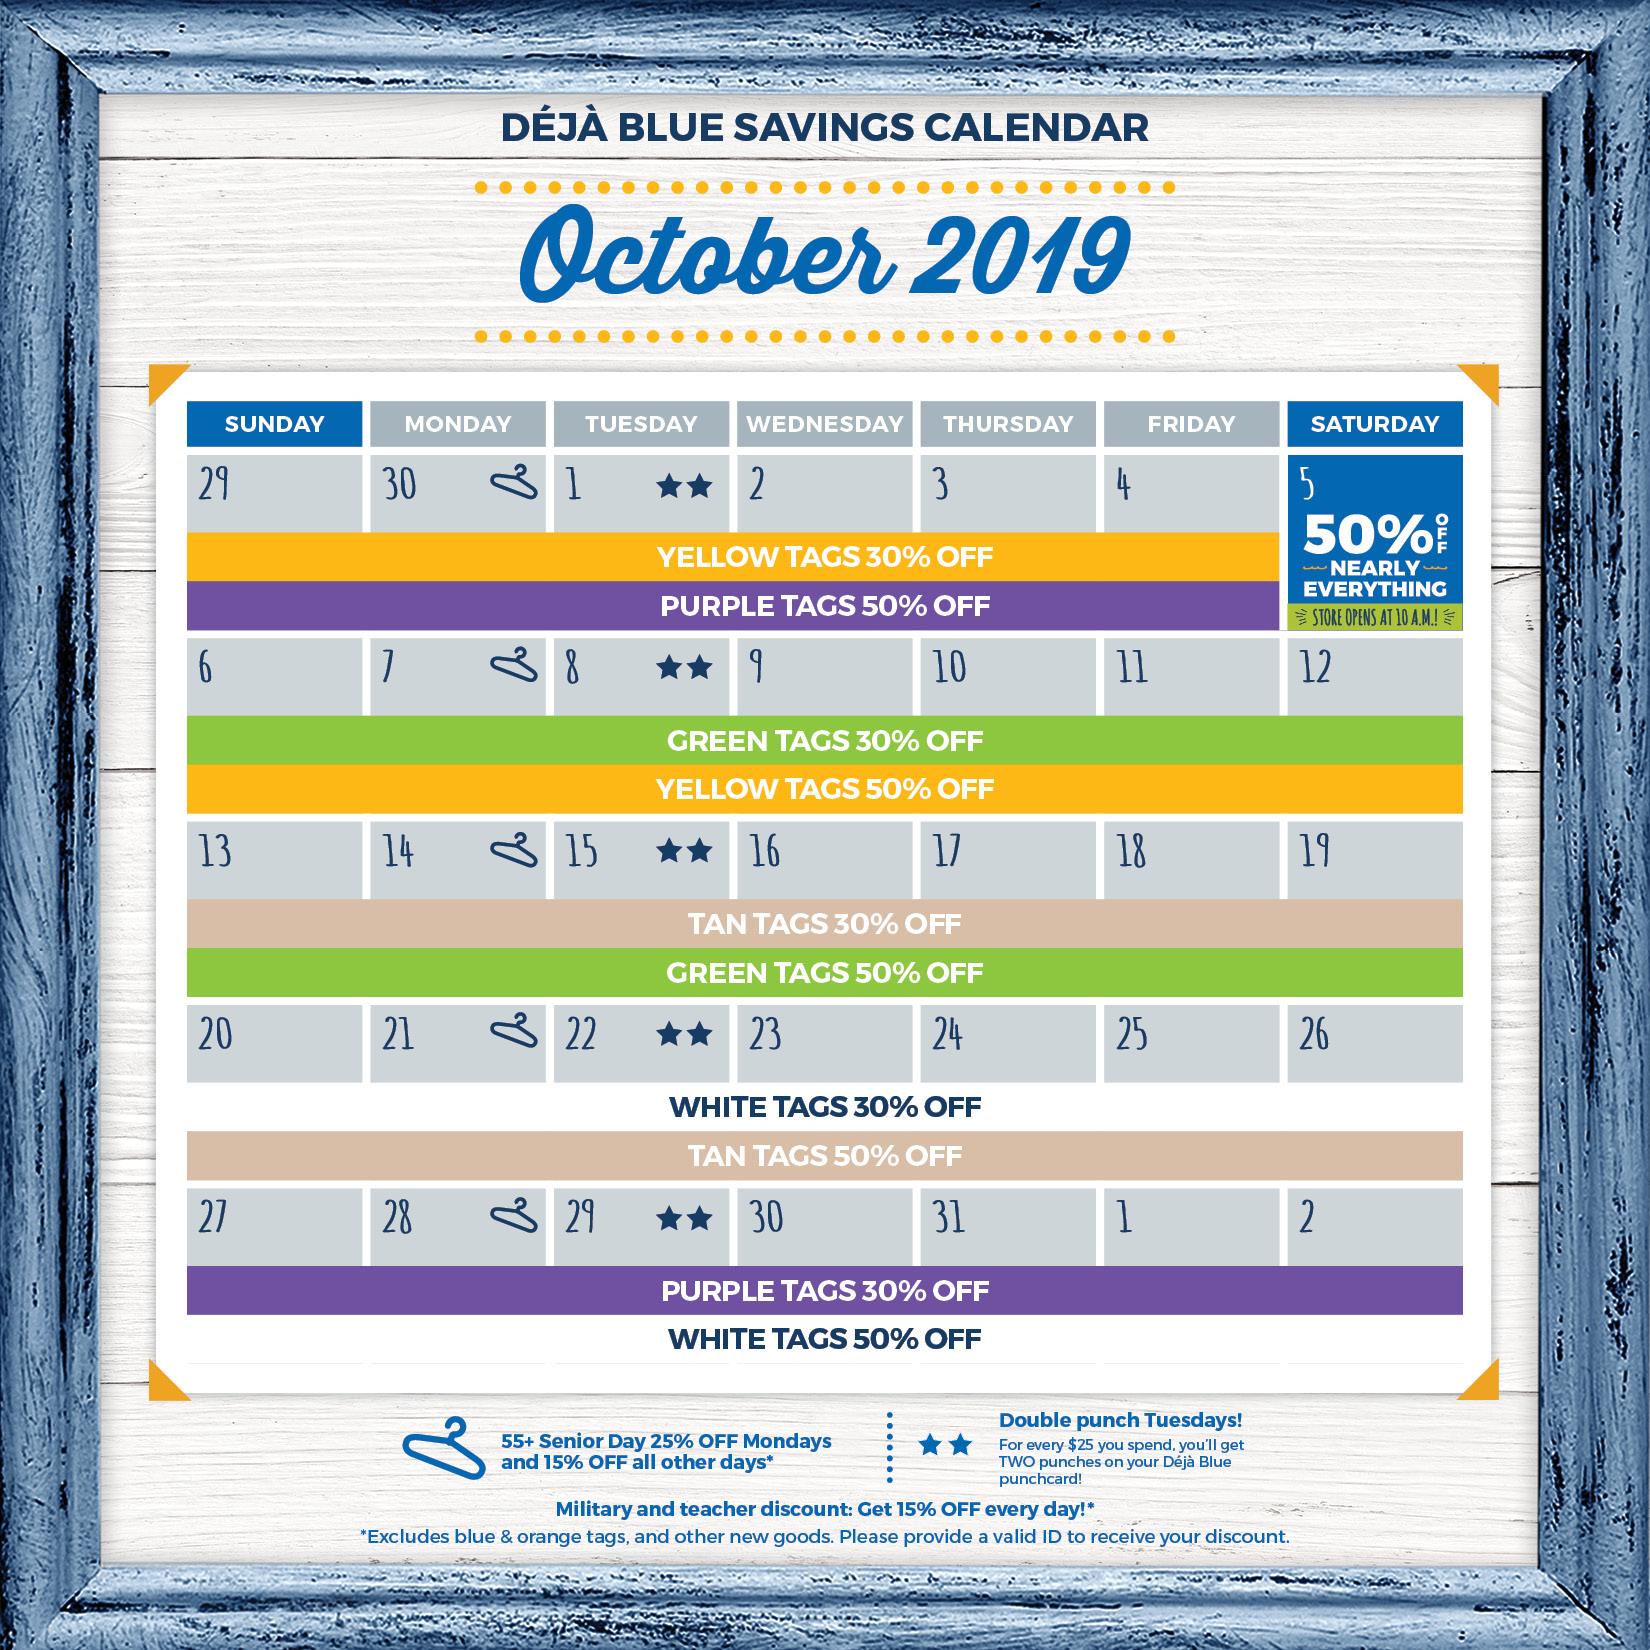 Click image to view larger calendar